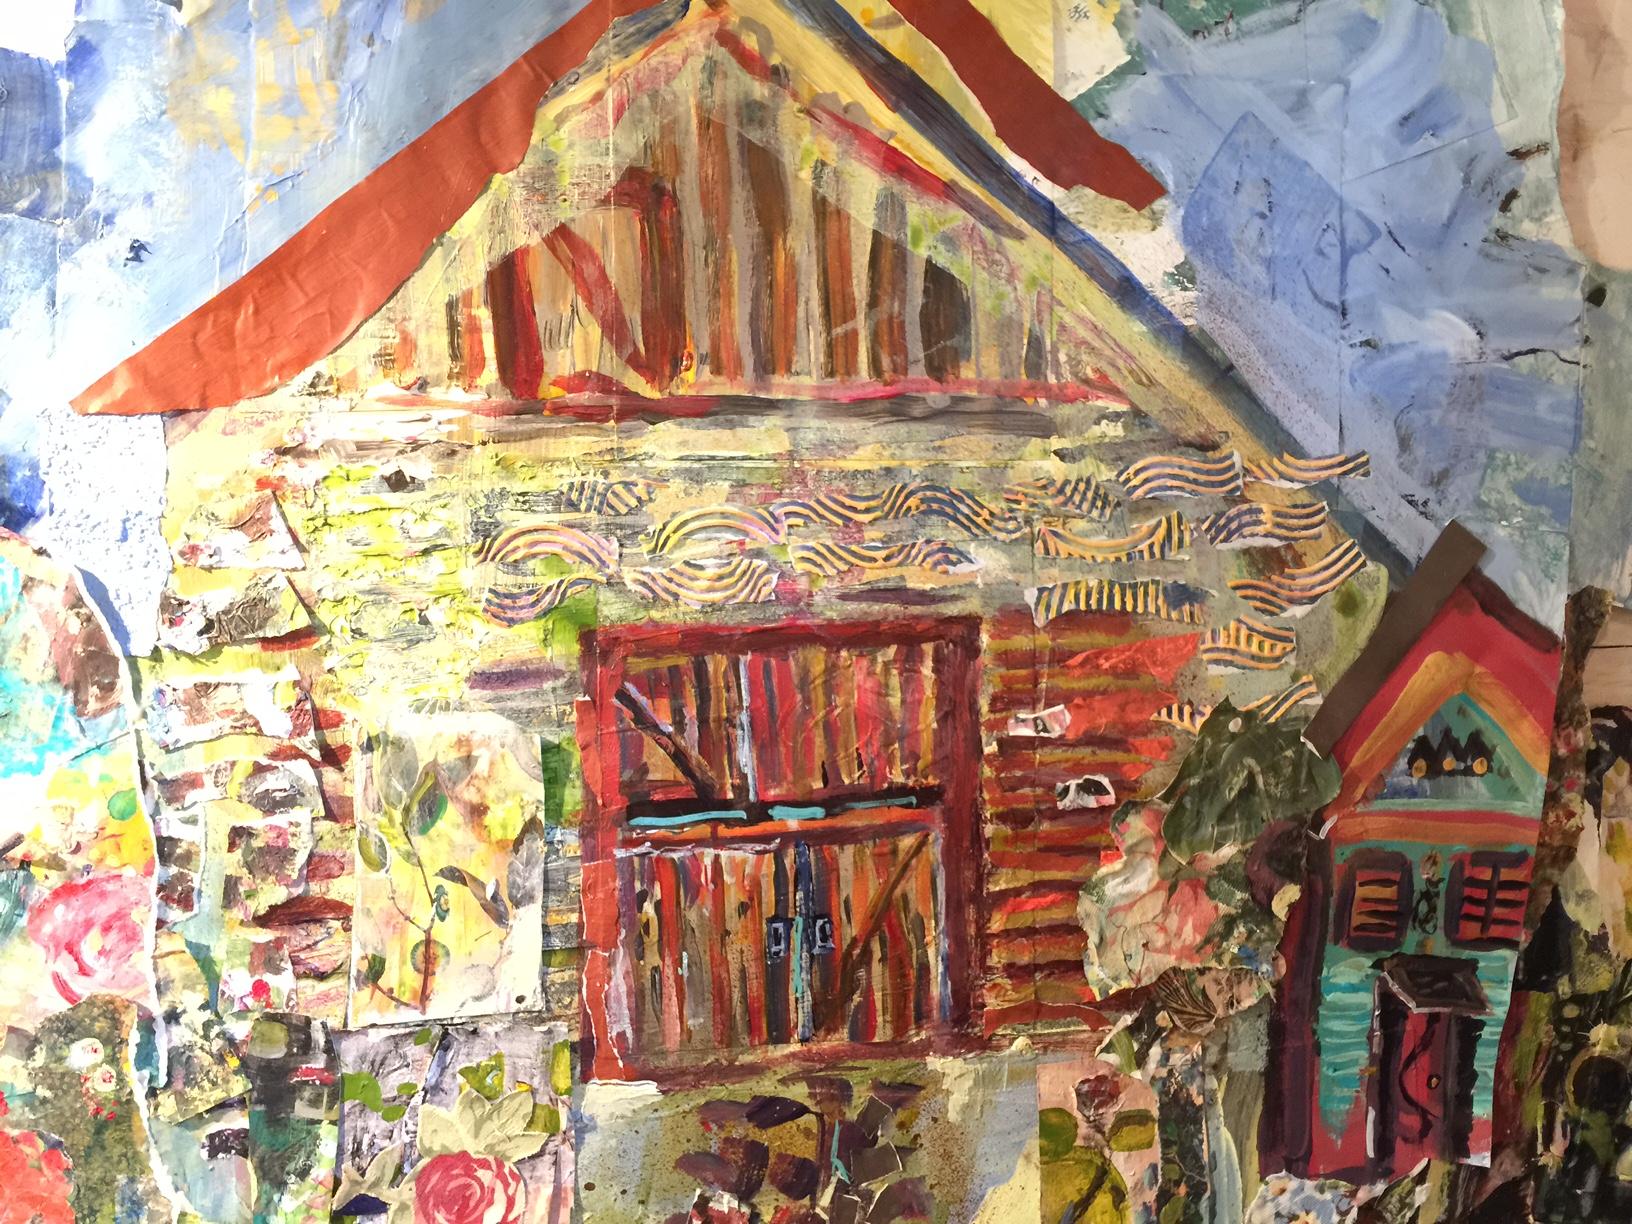 Barn Painting.jpg